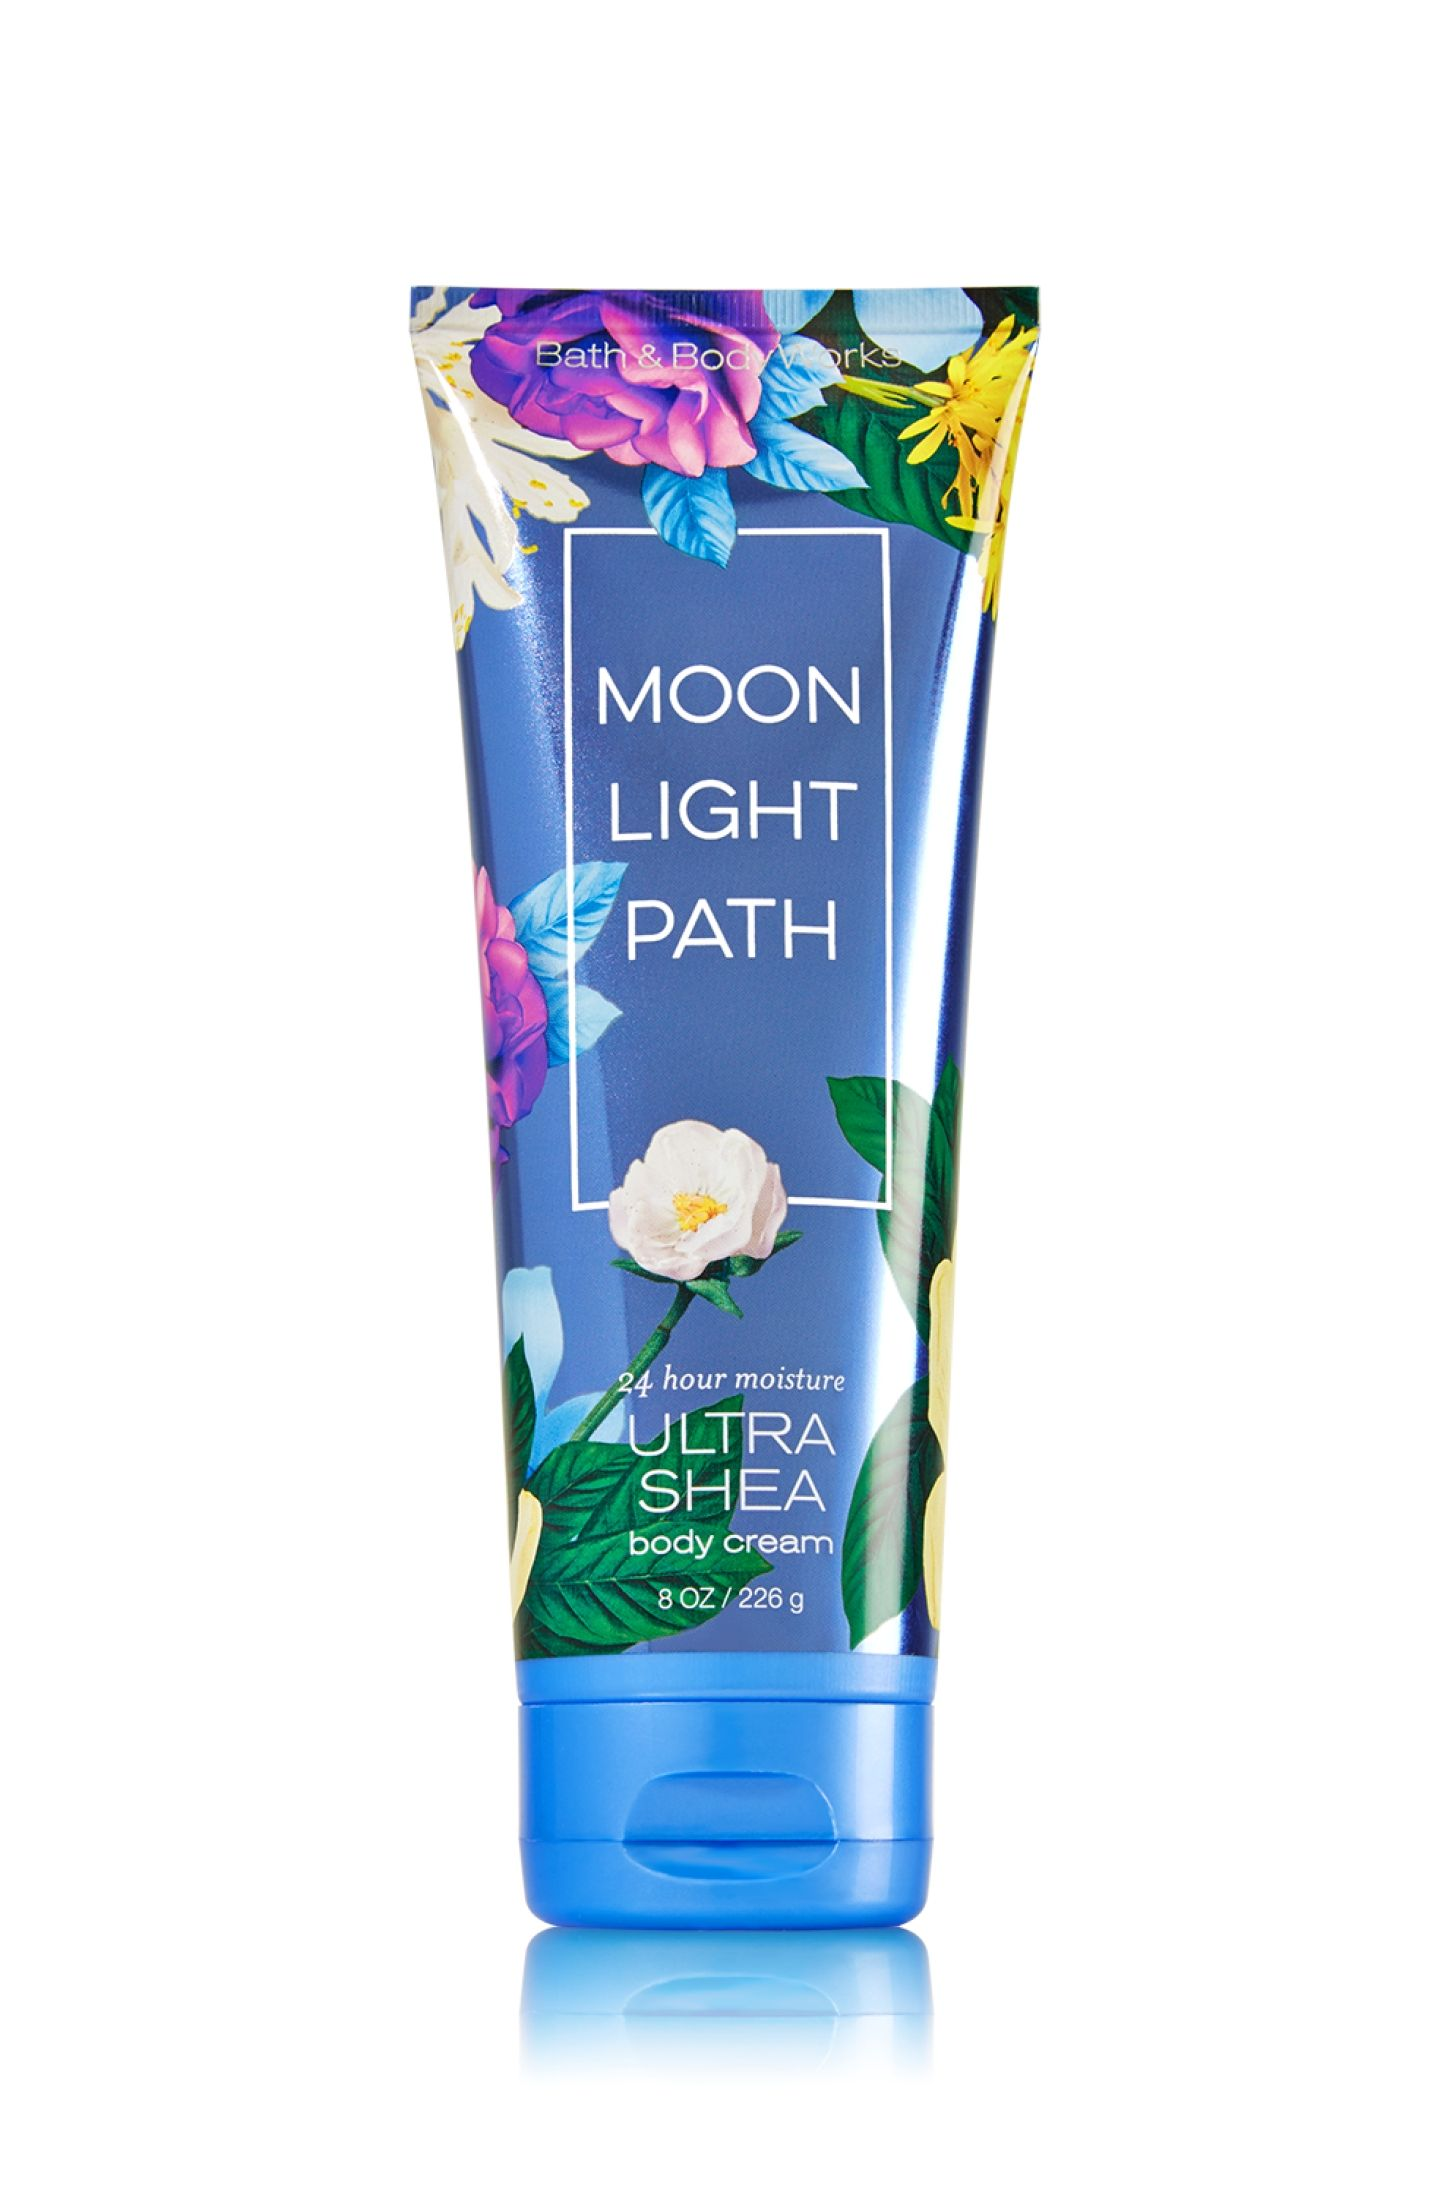 Signature Collection Moonlight Path Ultra Shea Body Cream